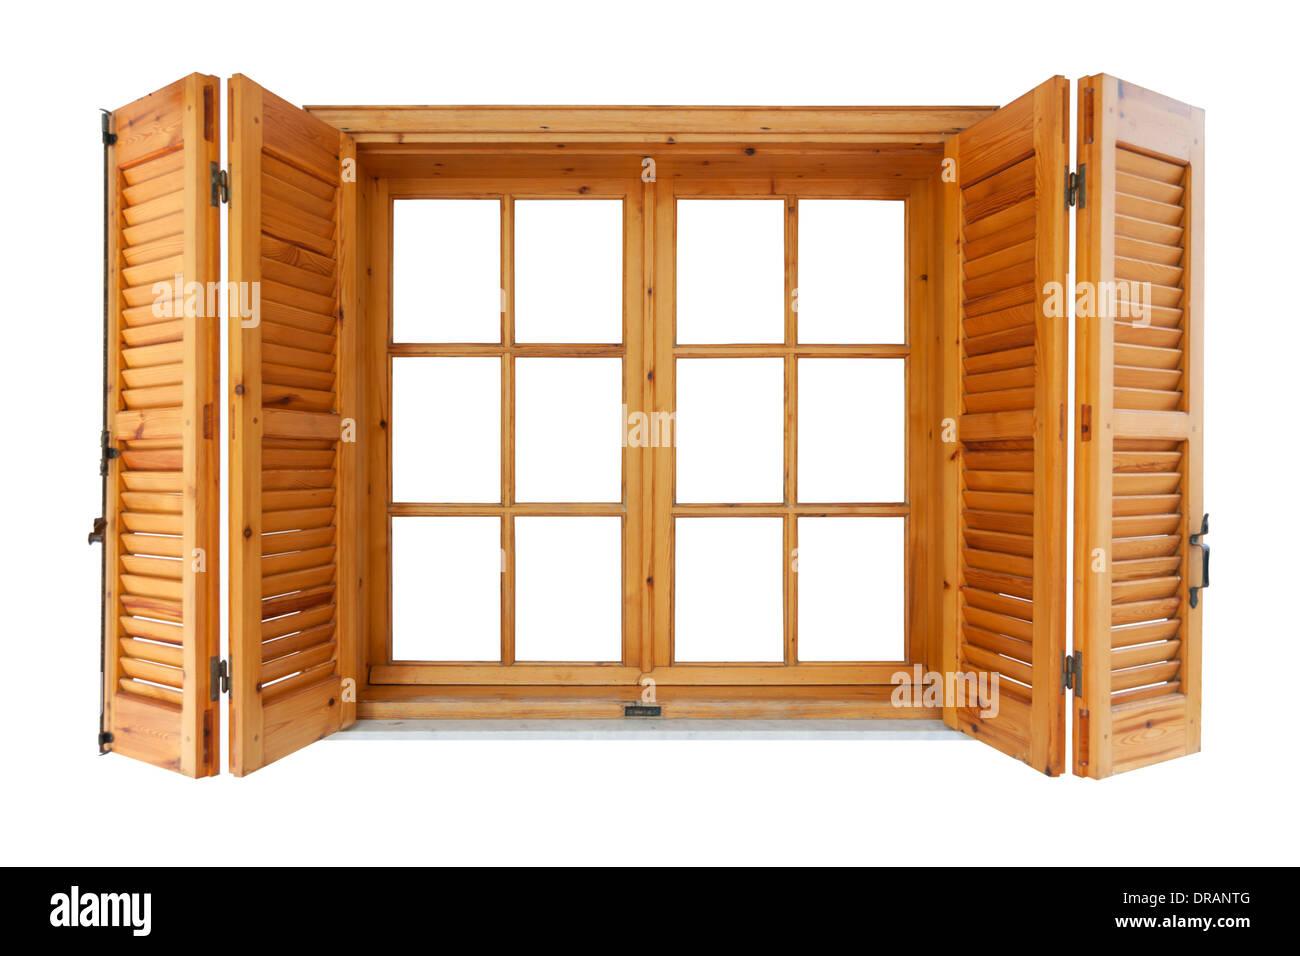 hinge cutout stock photos hinge cutout stock images alamy. Black Bedroom Furniture Sets. Home Design Ideas